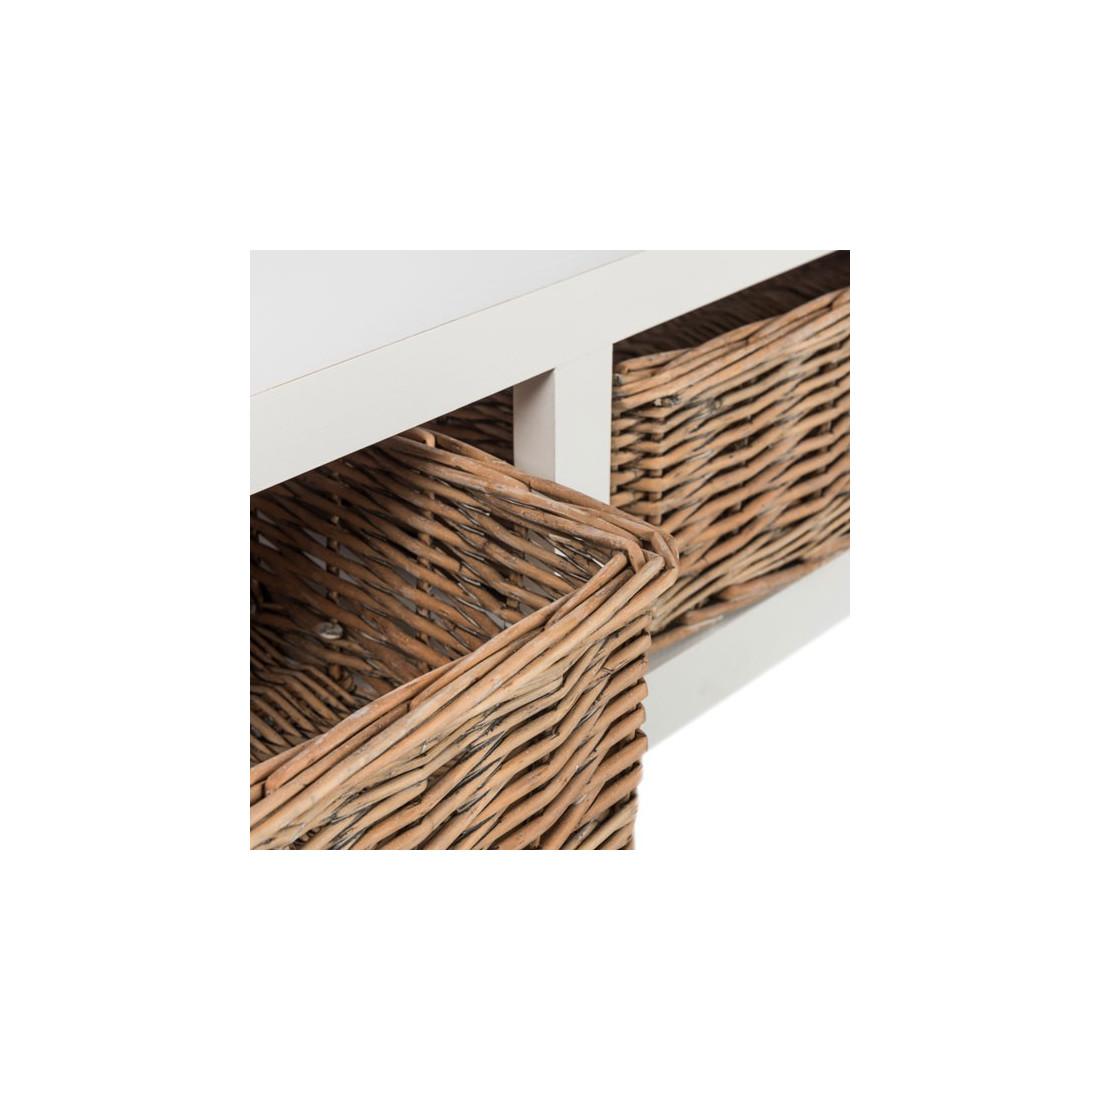 table basse rectangulaire 2 paniers en osier marin. Black Bedroom Furniture Sets. Home Design Ideas